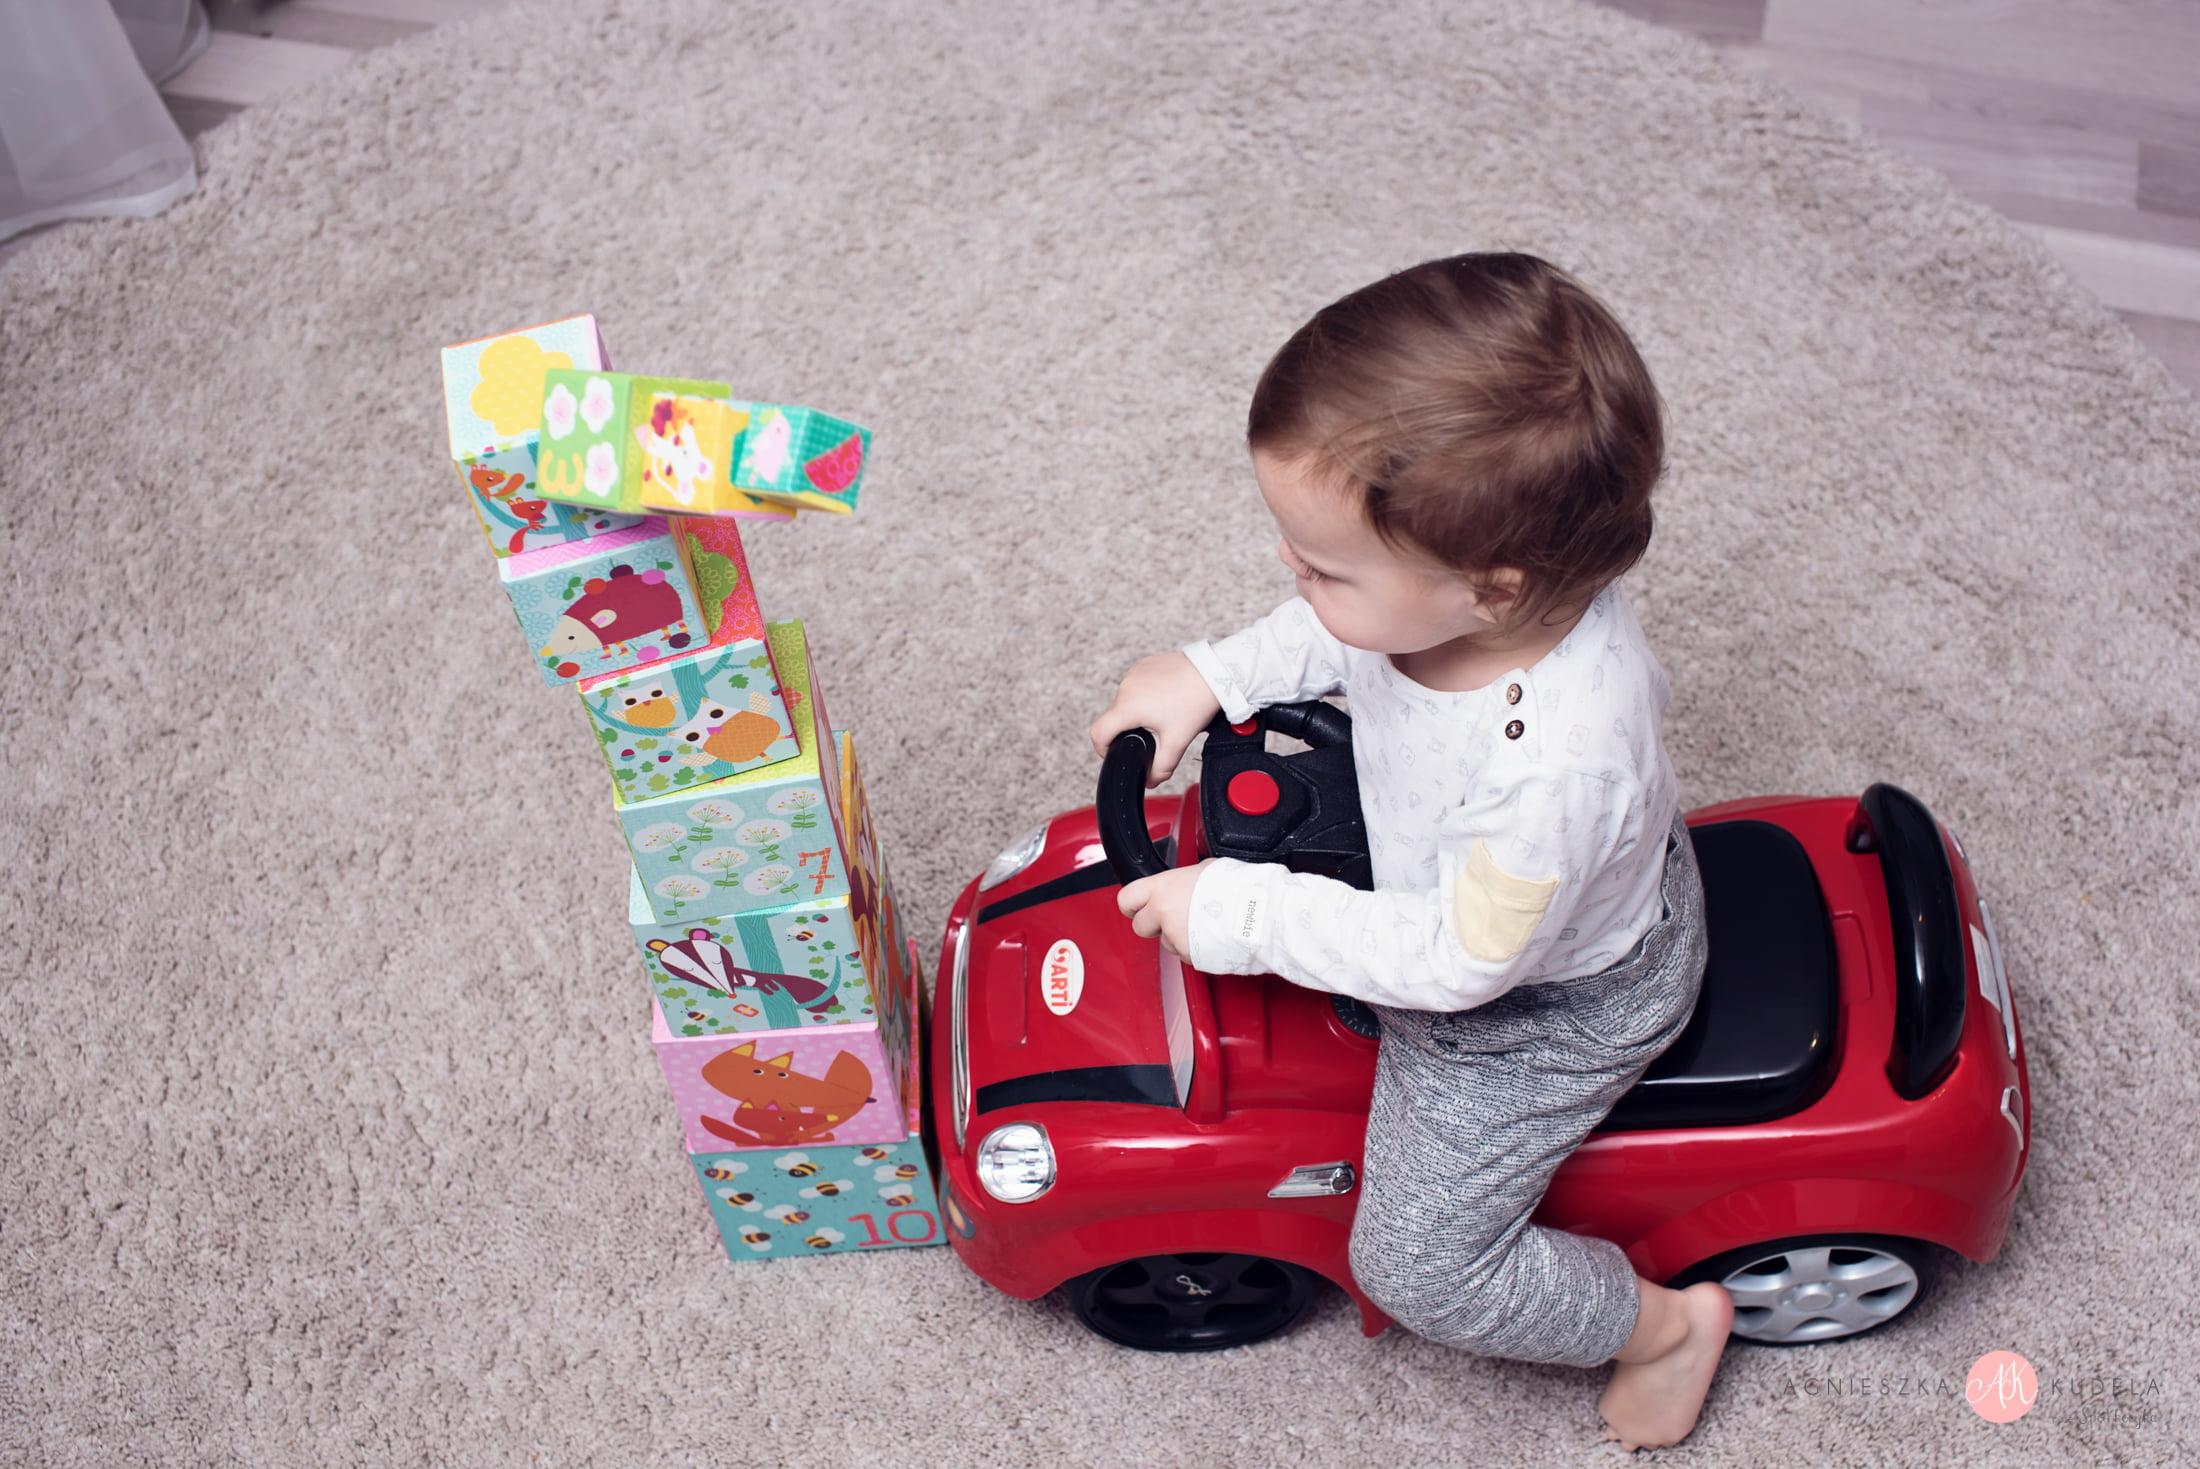 zabawki edukacyjne 2 lata